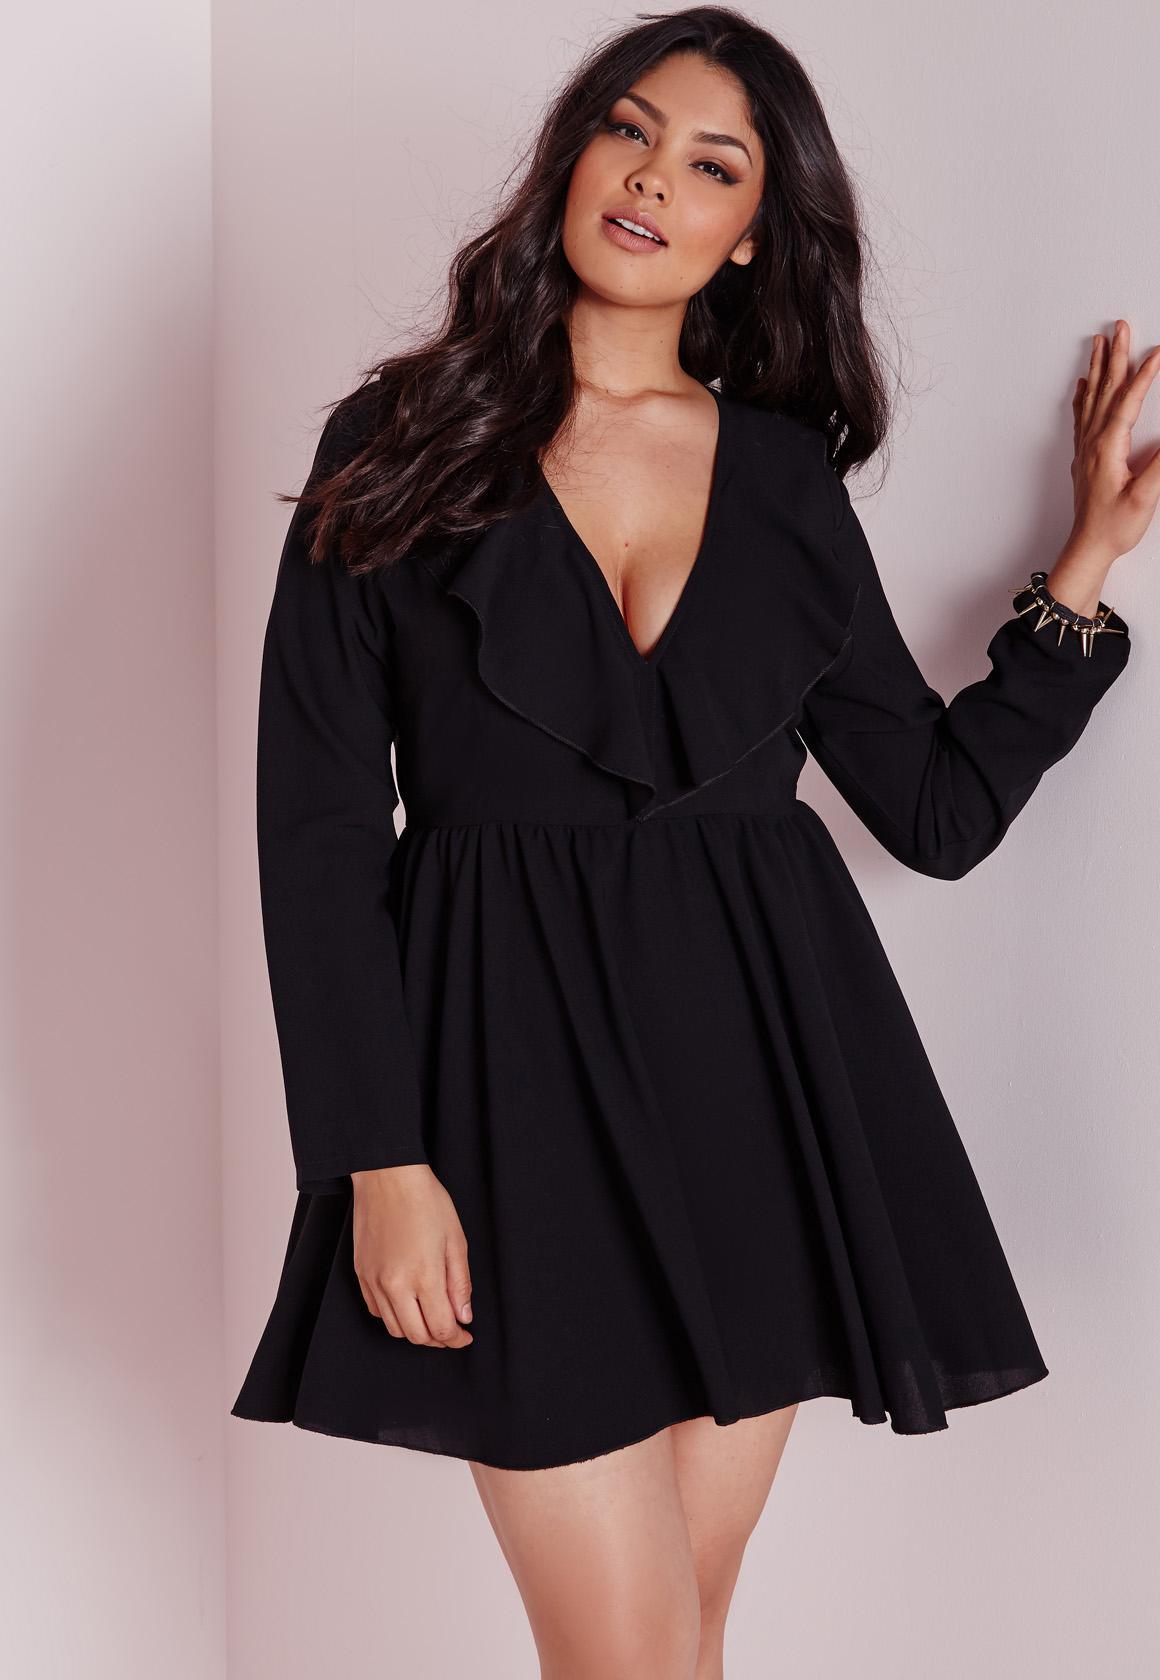 Plus Size Frill Swing Dress Black   Missguided